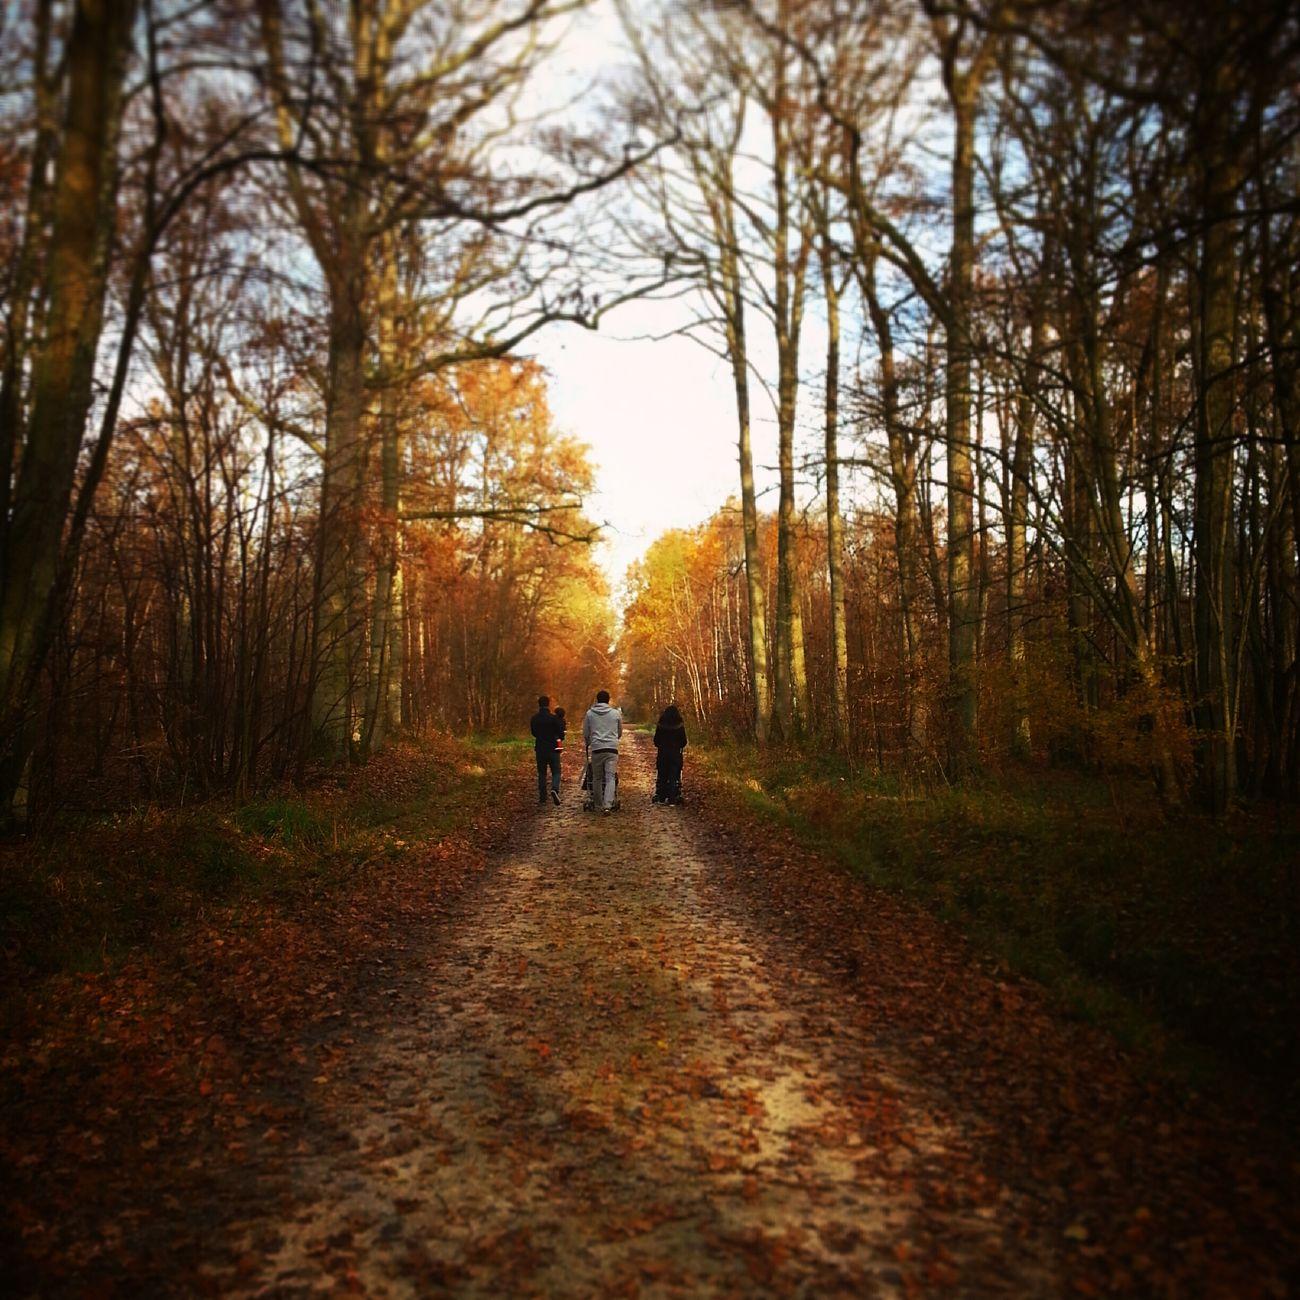 Parisian autumn Vanishing Point Chasinglight Autumn Colors Naturelovers Landscape